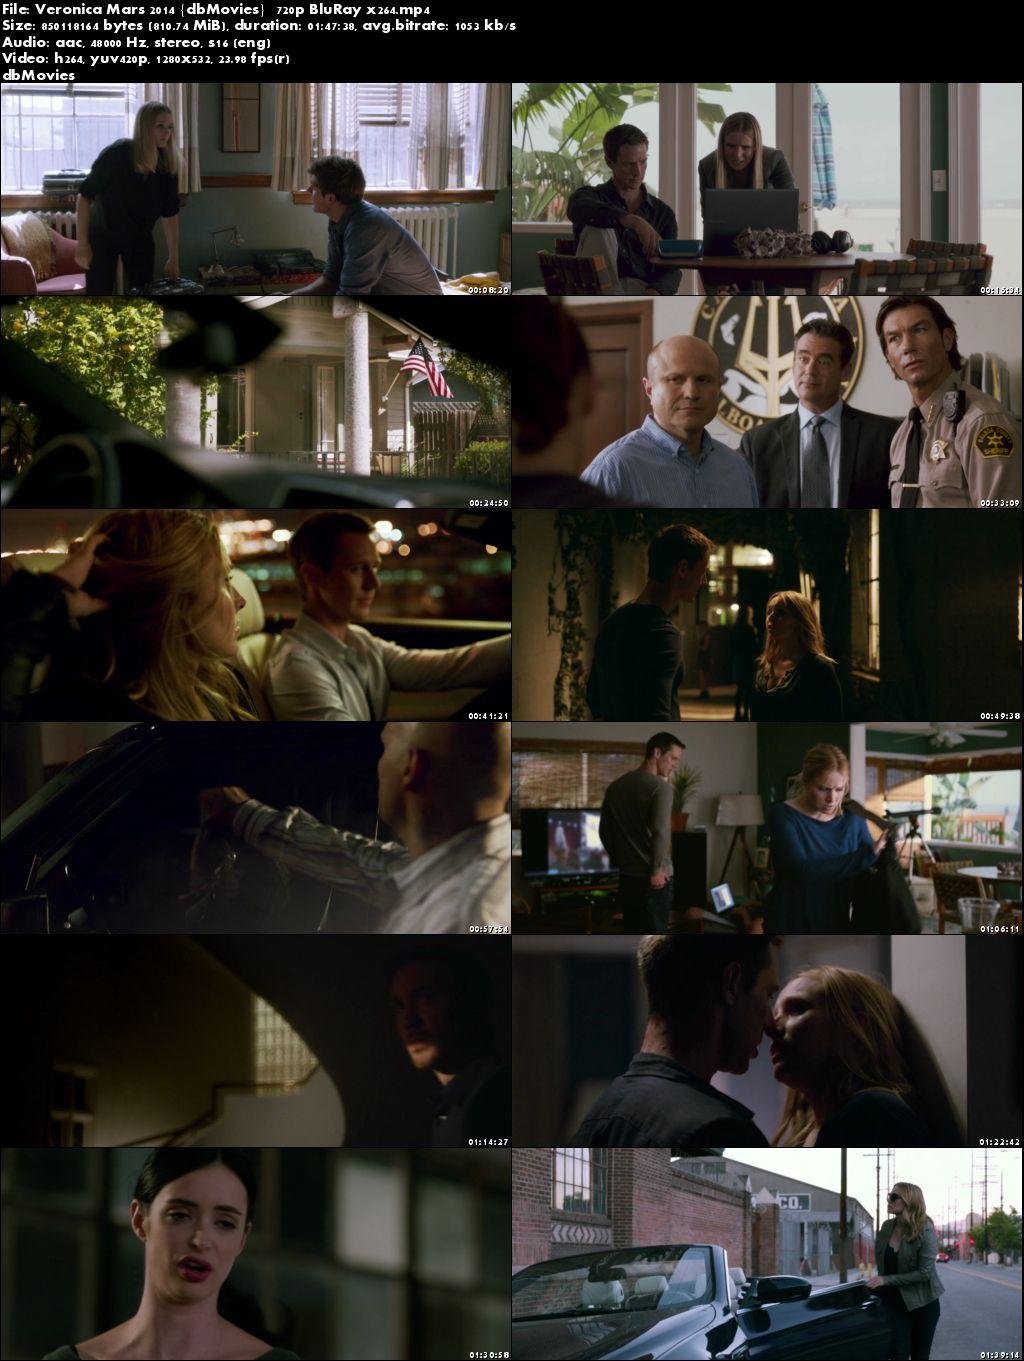 Screen Shots Veronica Mars 2014 Full Movie Download in English HD 720p